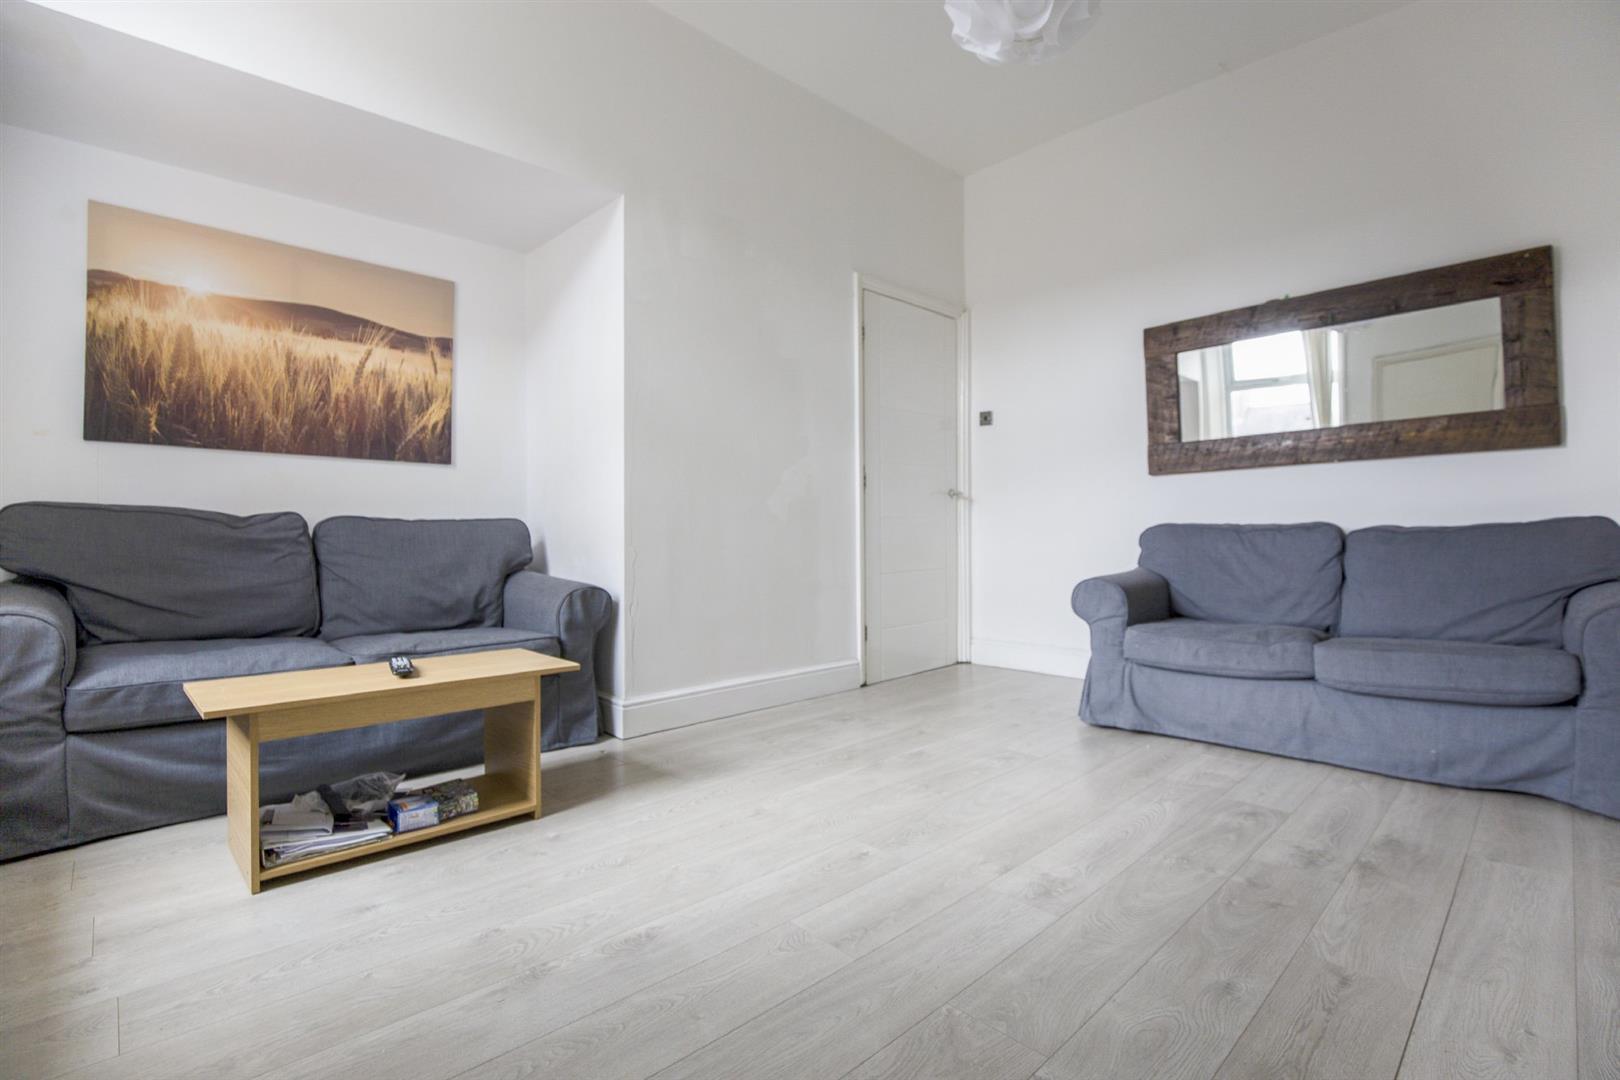 4 bed maisonette to rent in Newcastle upon Tyne, NE6 5BU  - Property Image 2